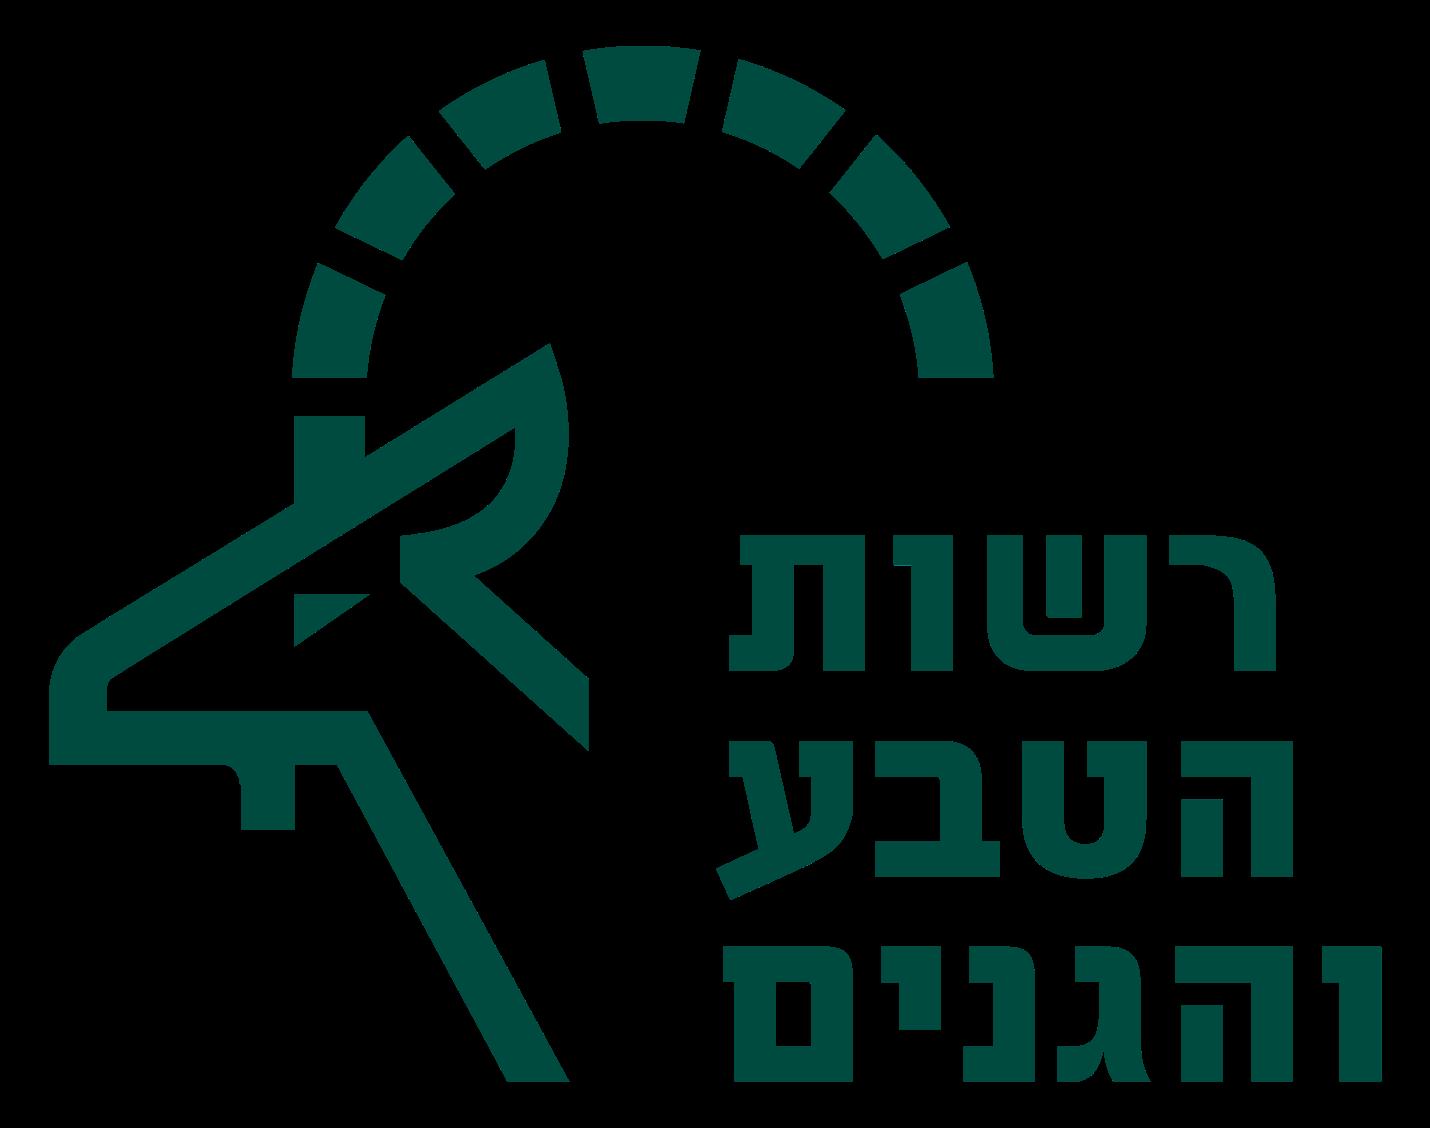 Israel_NPA.svg